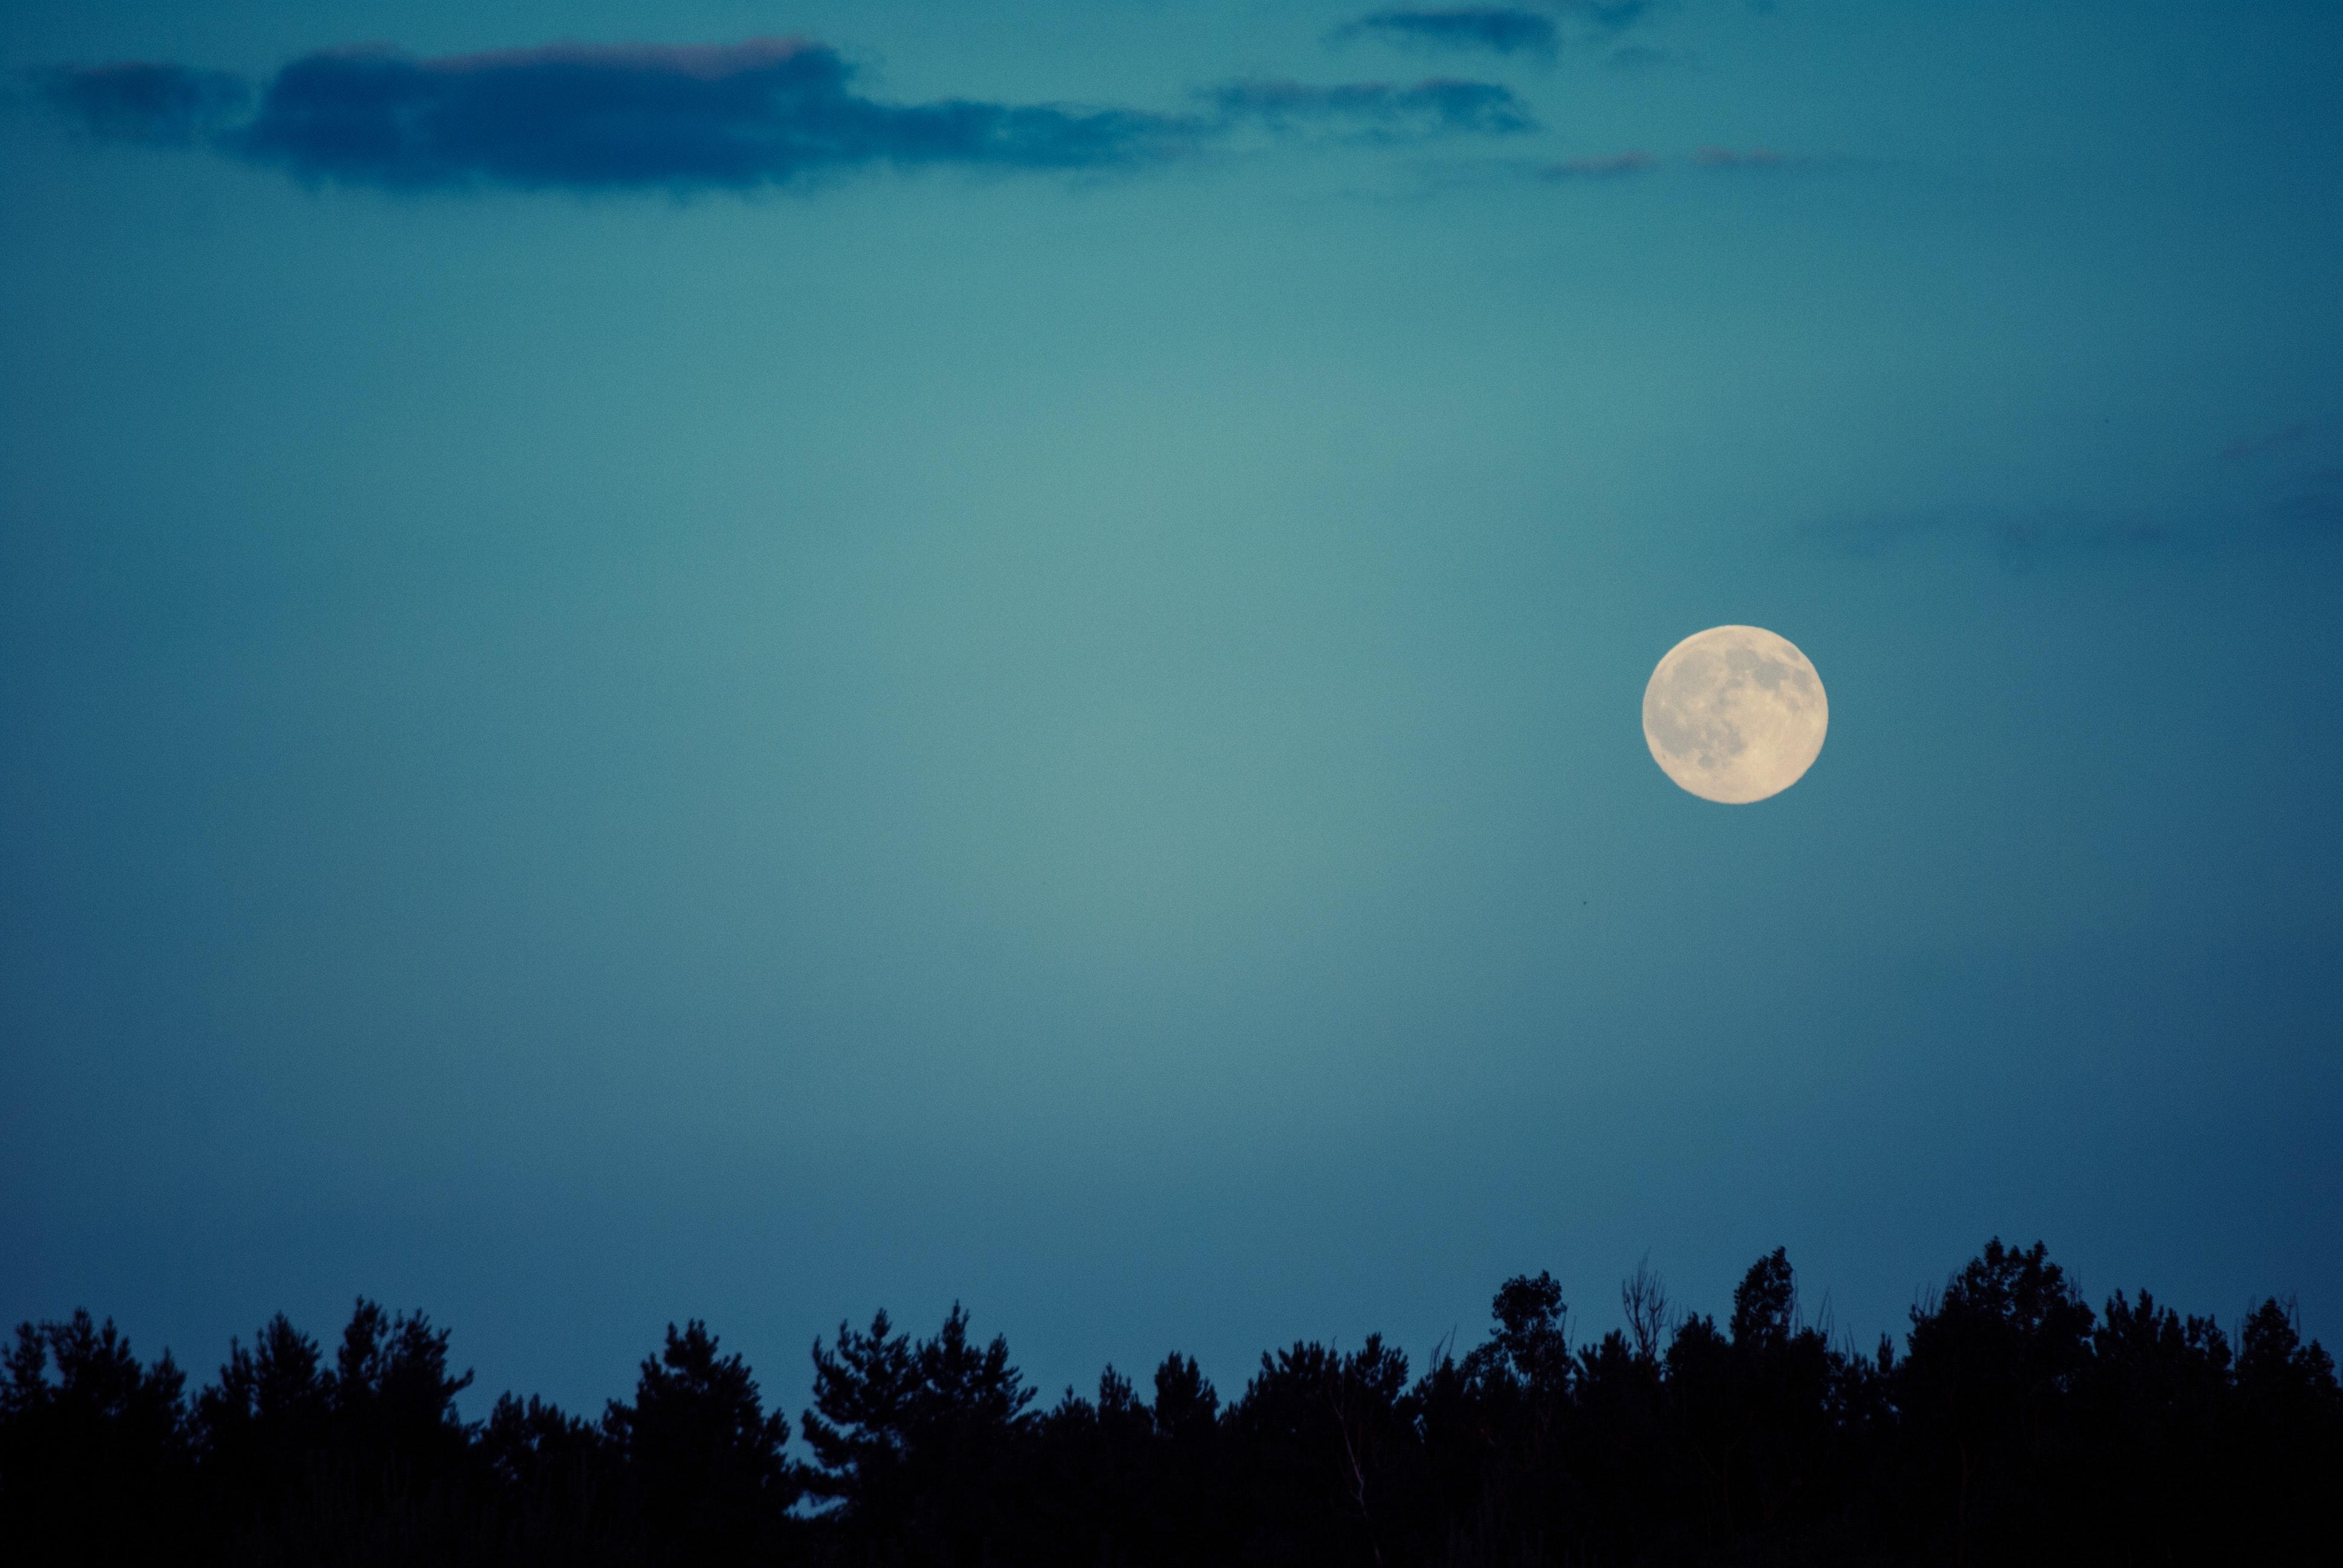 moon-night-8170.jpg